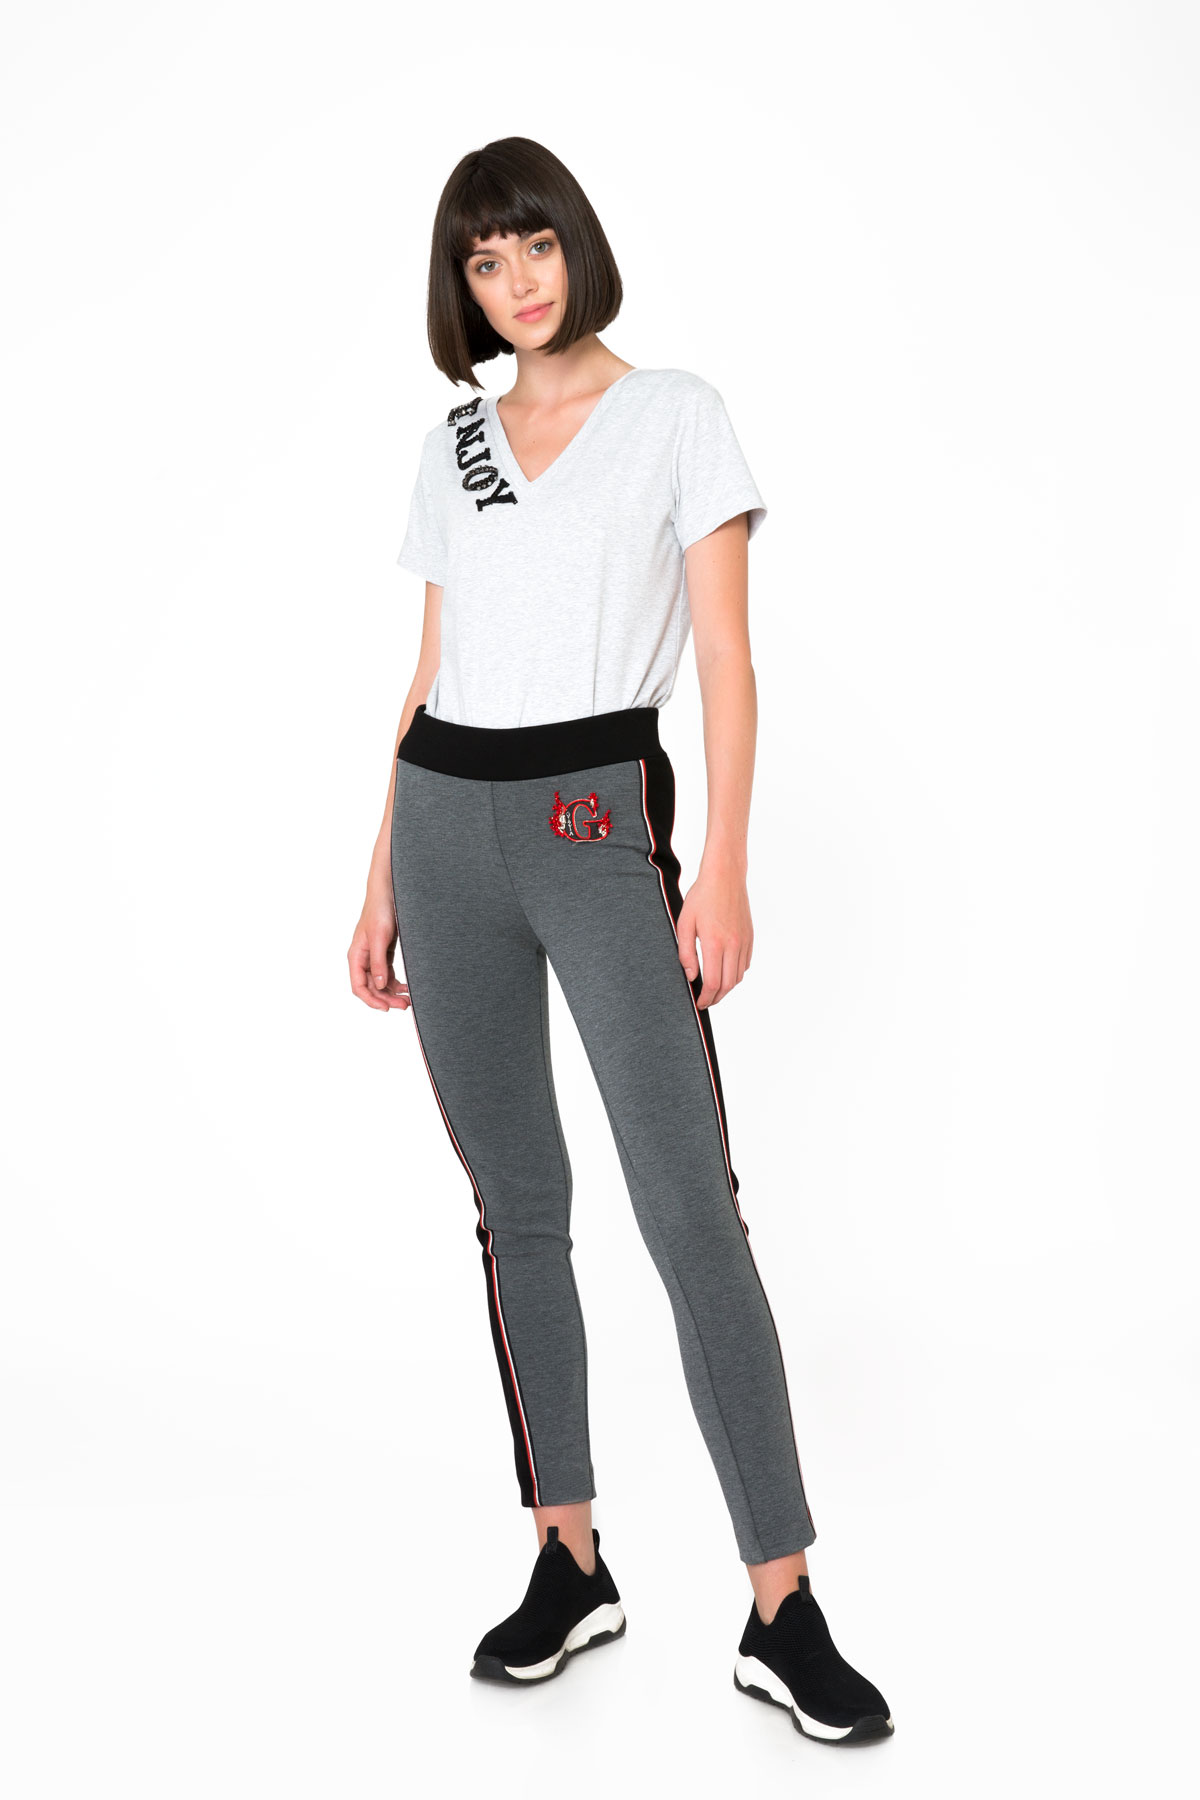 Contrast Band Detail Gray Sport Leggings